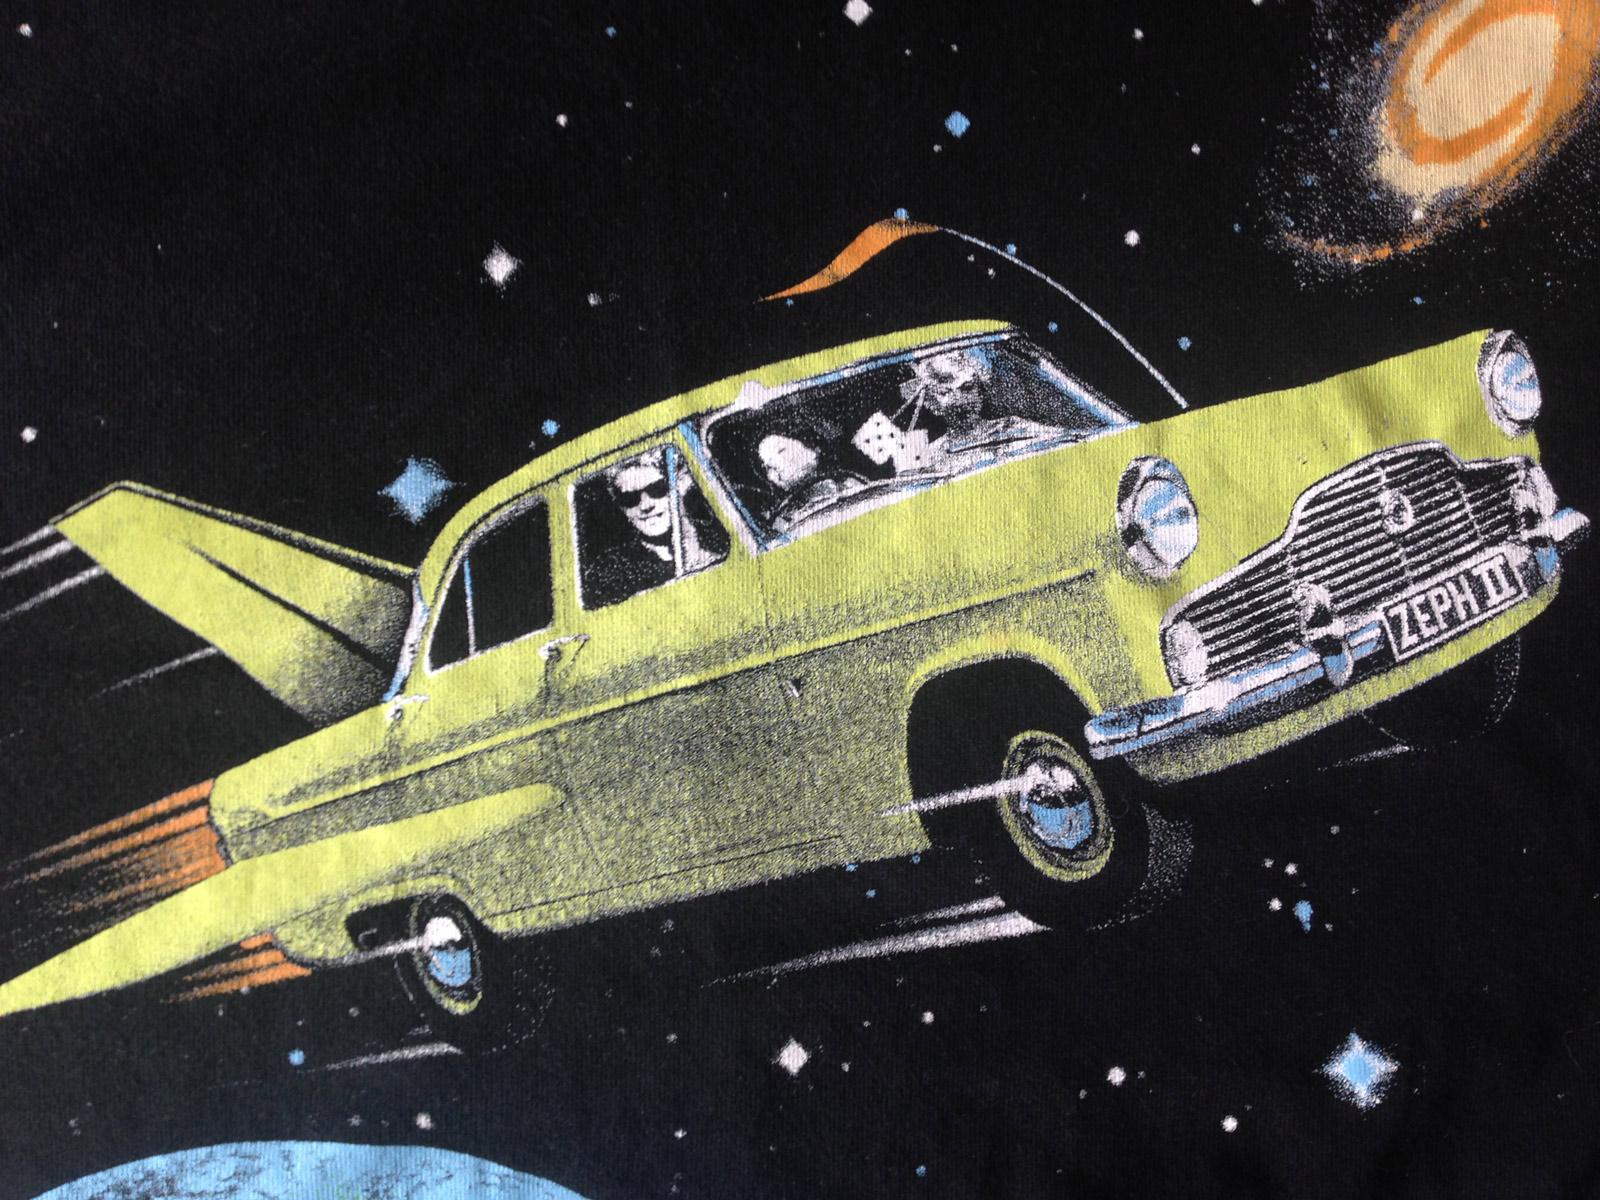 'Kiwi Space Shuttle' print detail.